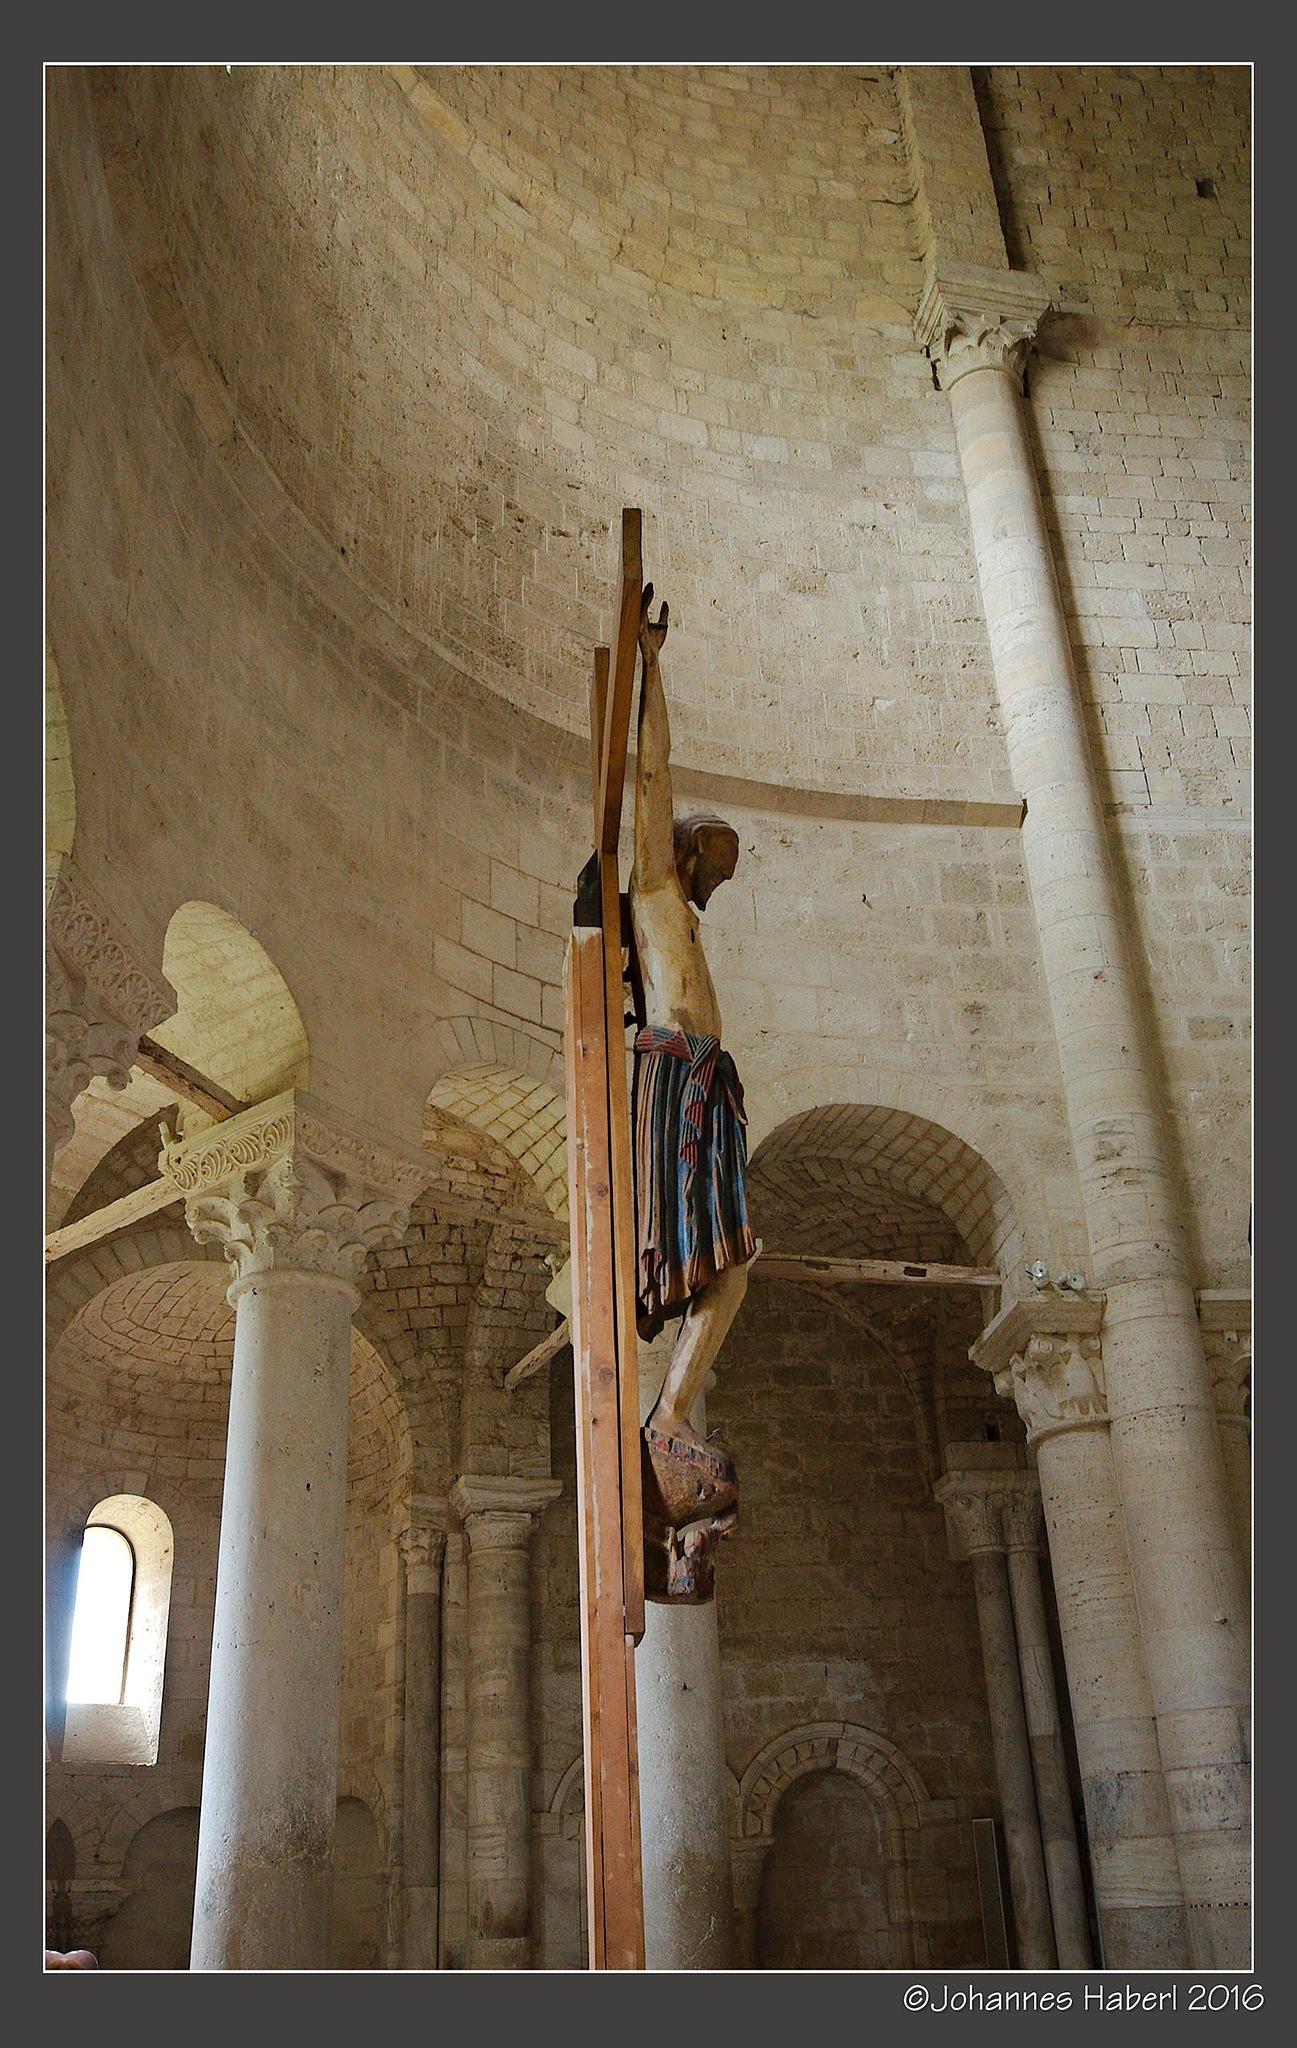 San Antimo - Cross inside by Johannes Haberl